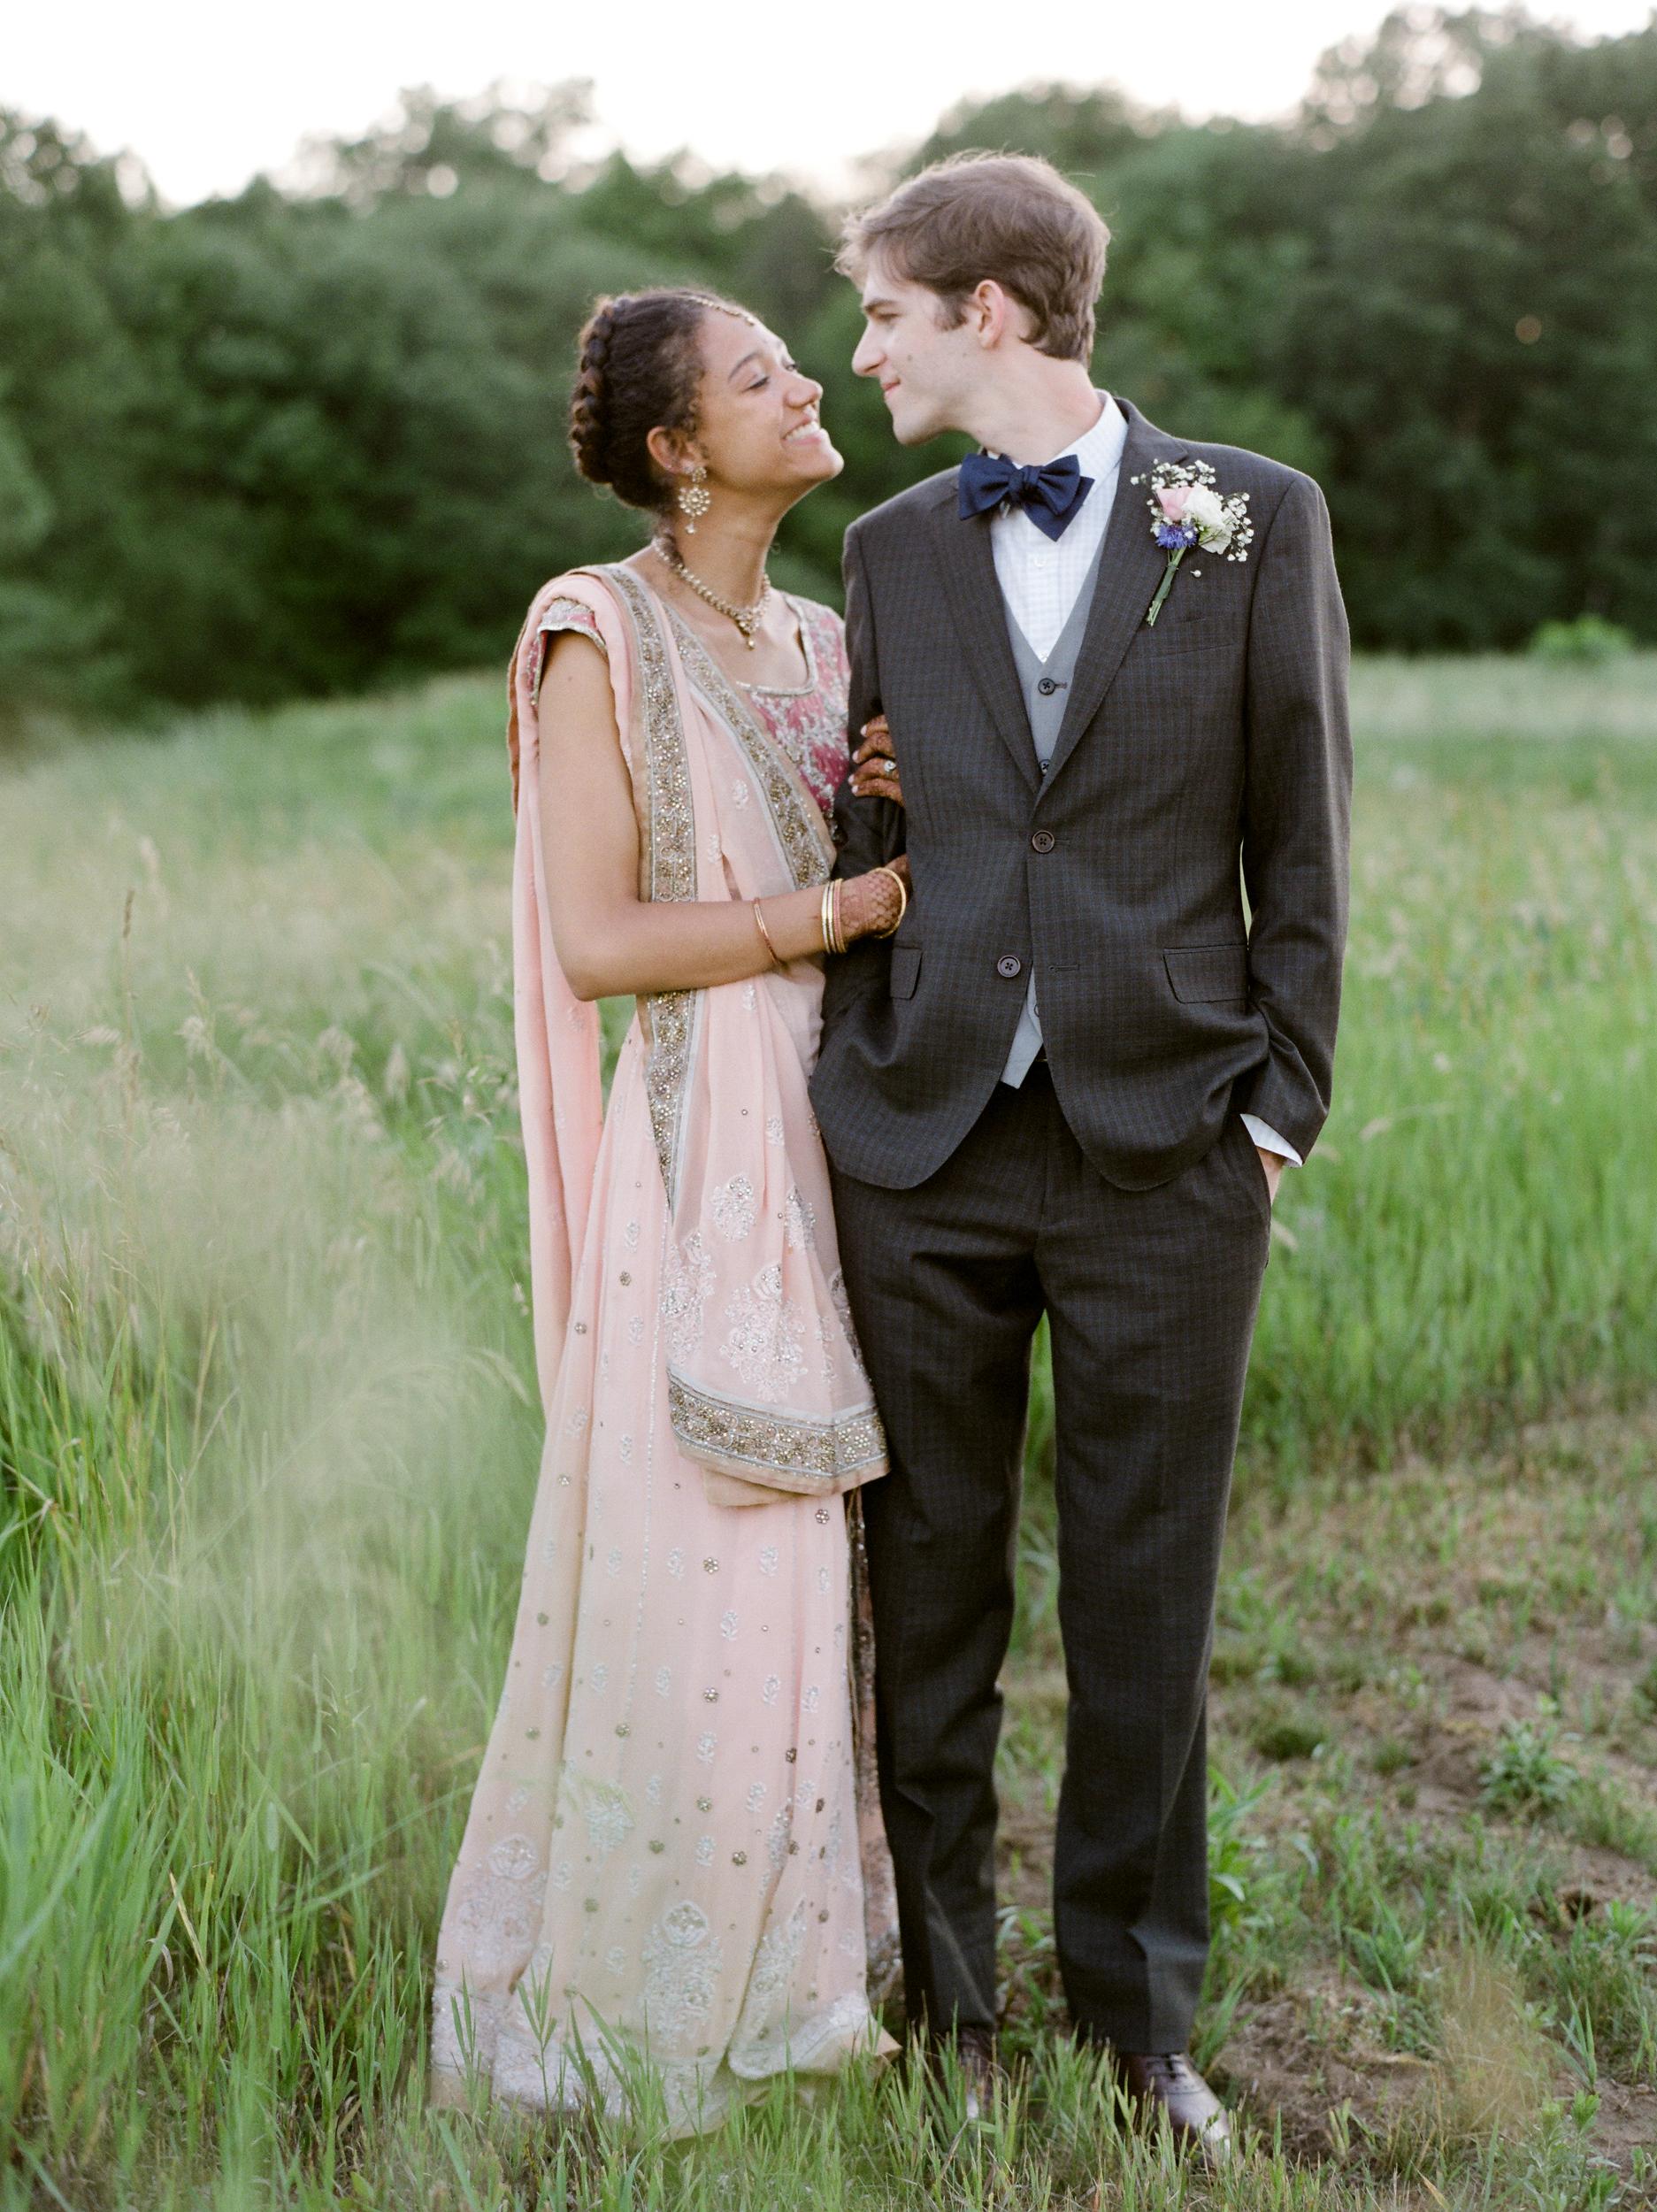 Wedding Photography near Boston